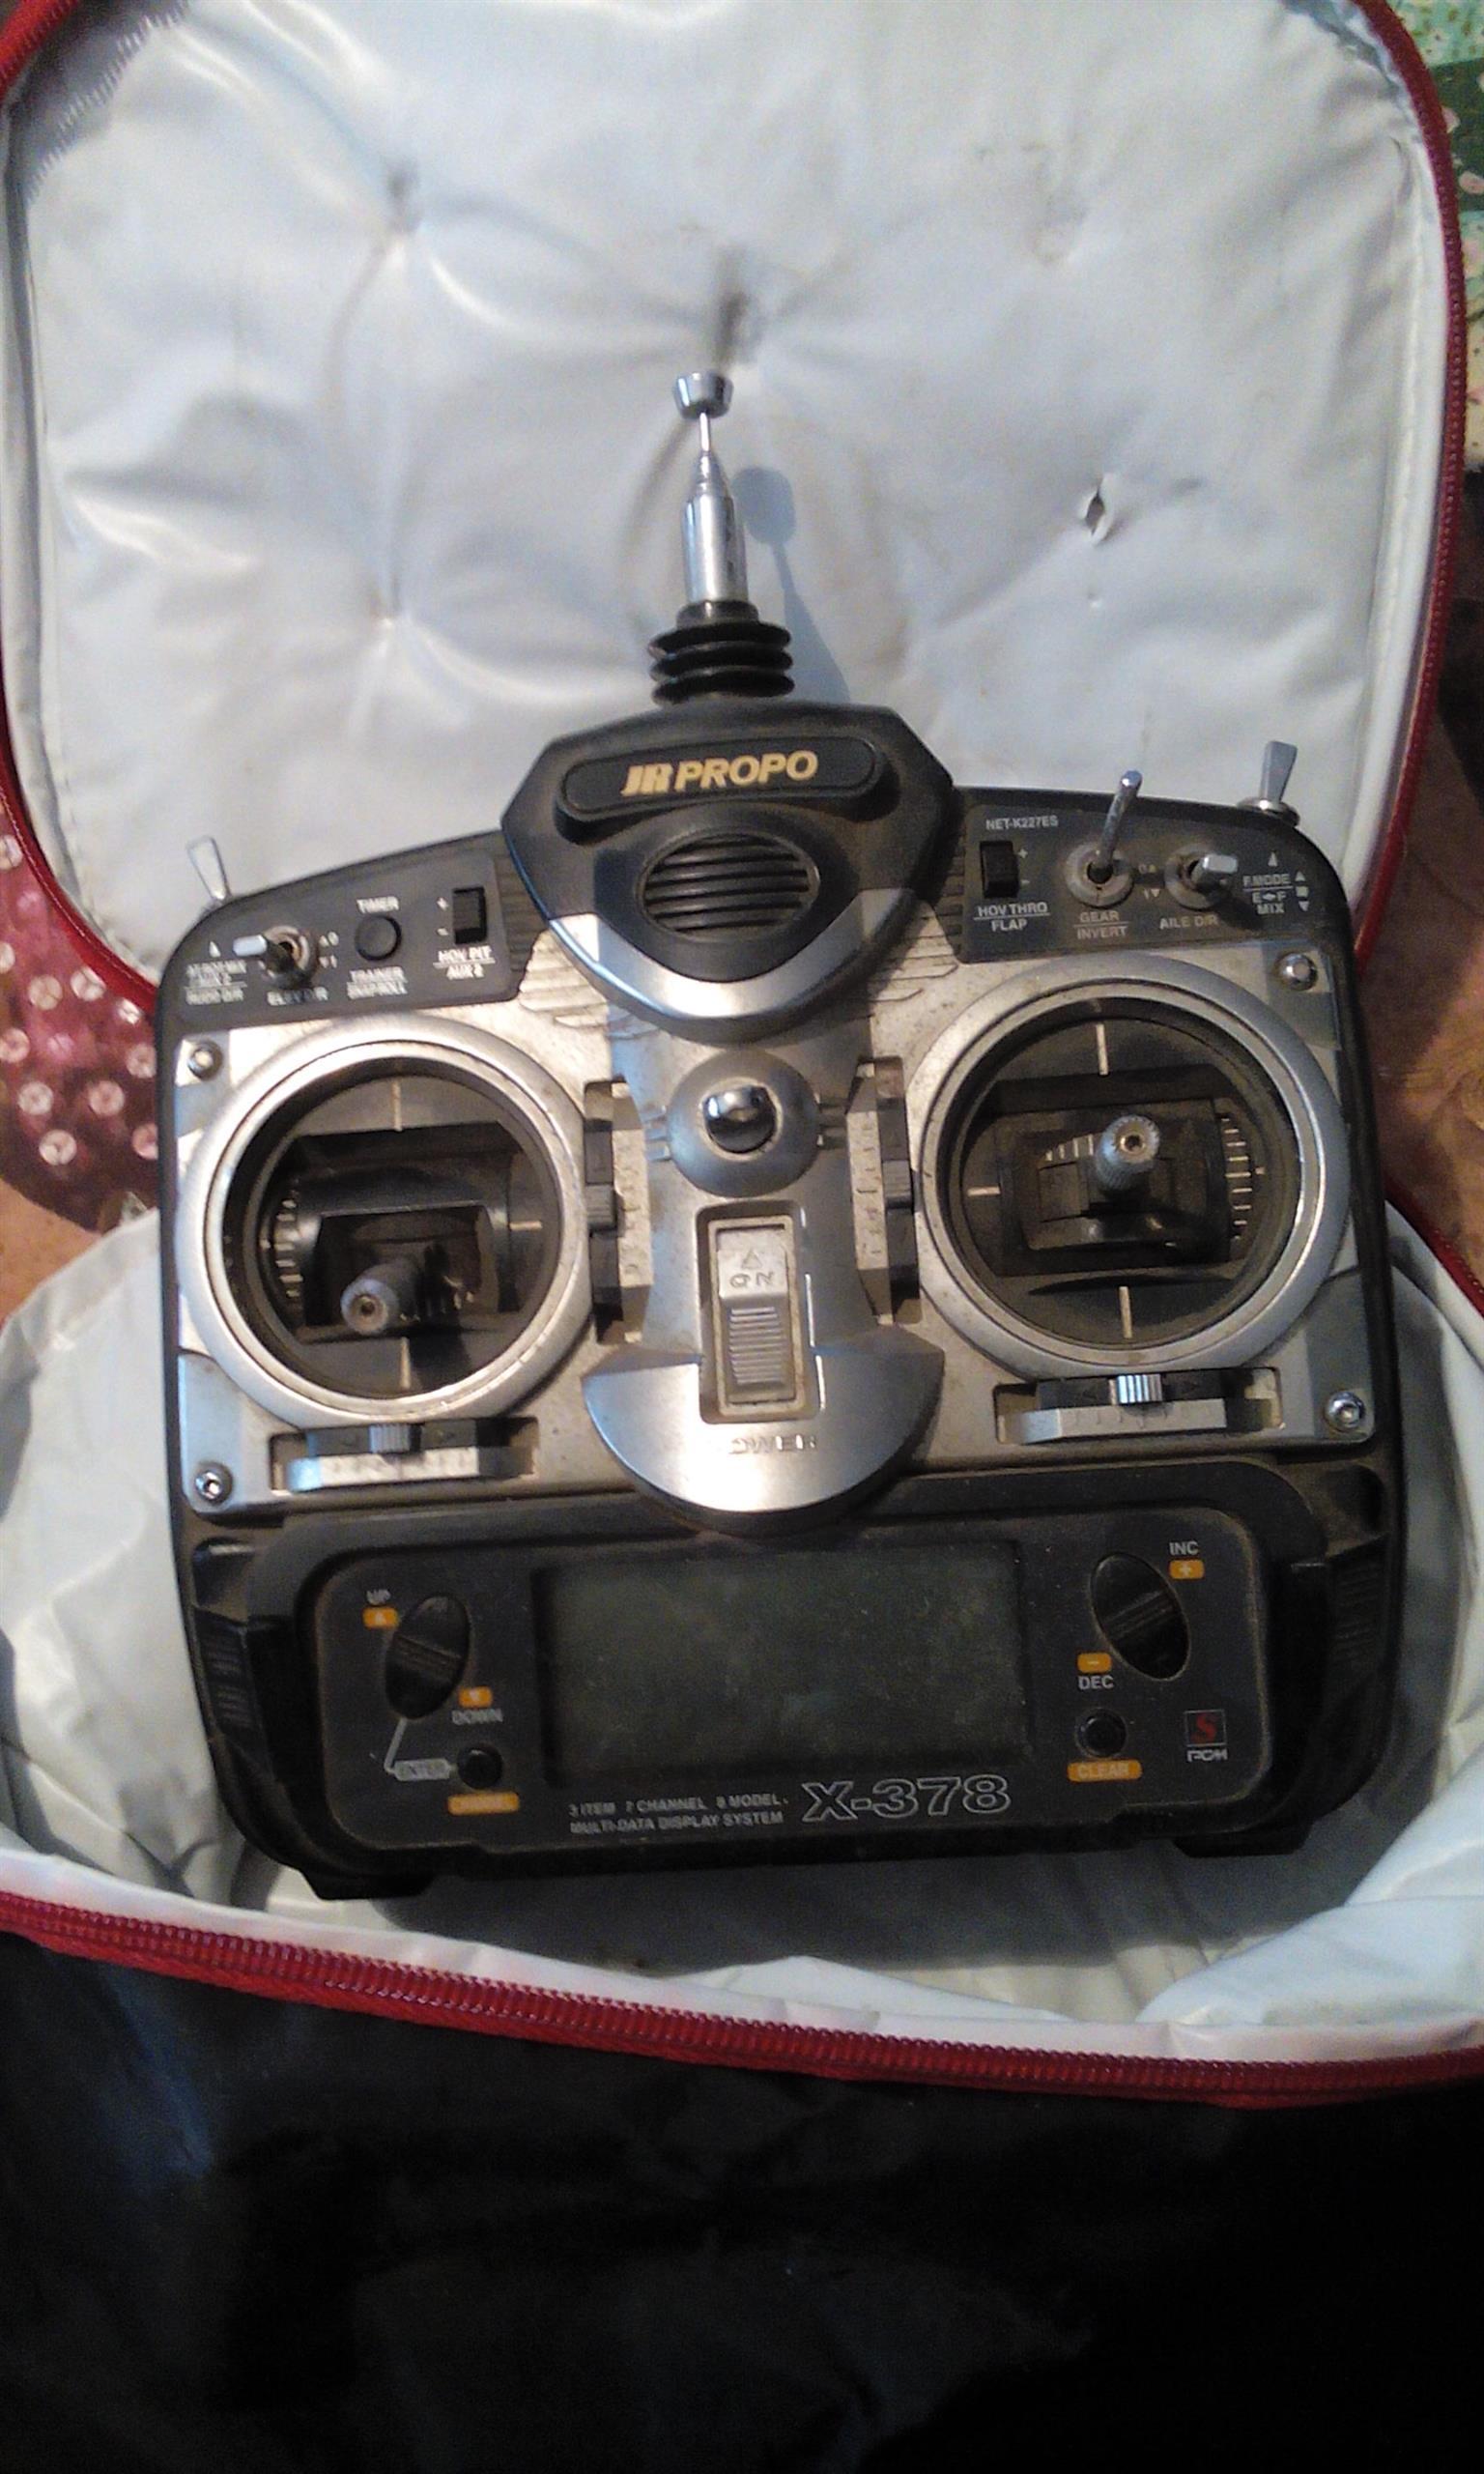 PROPO X-3810 Radio Control